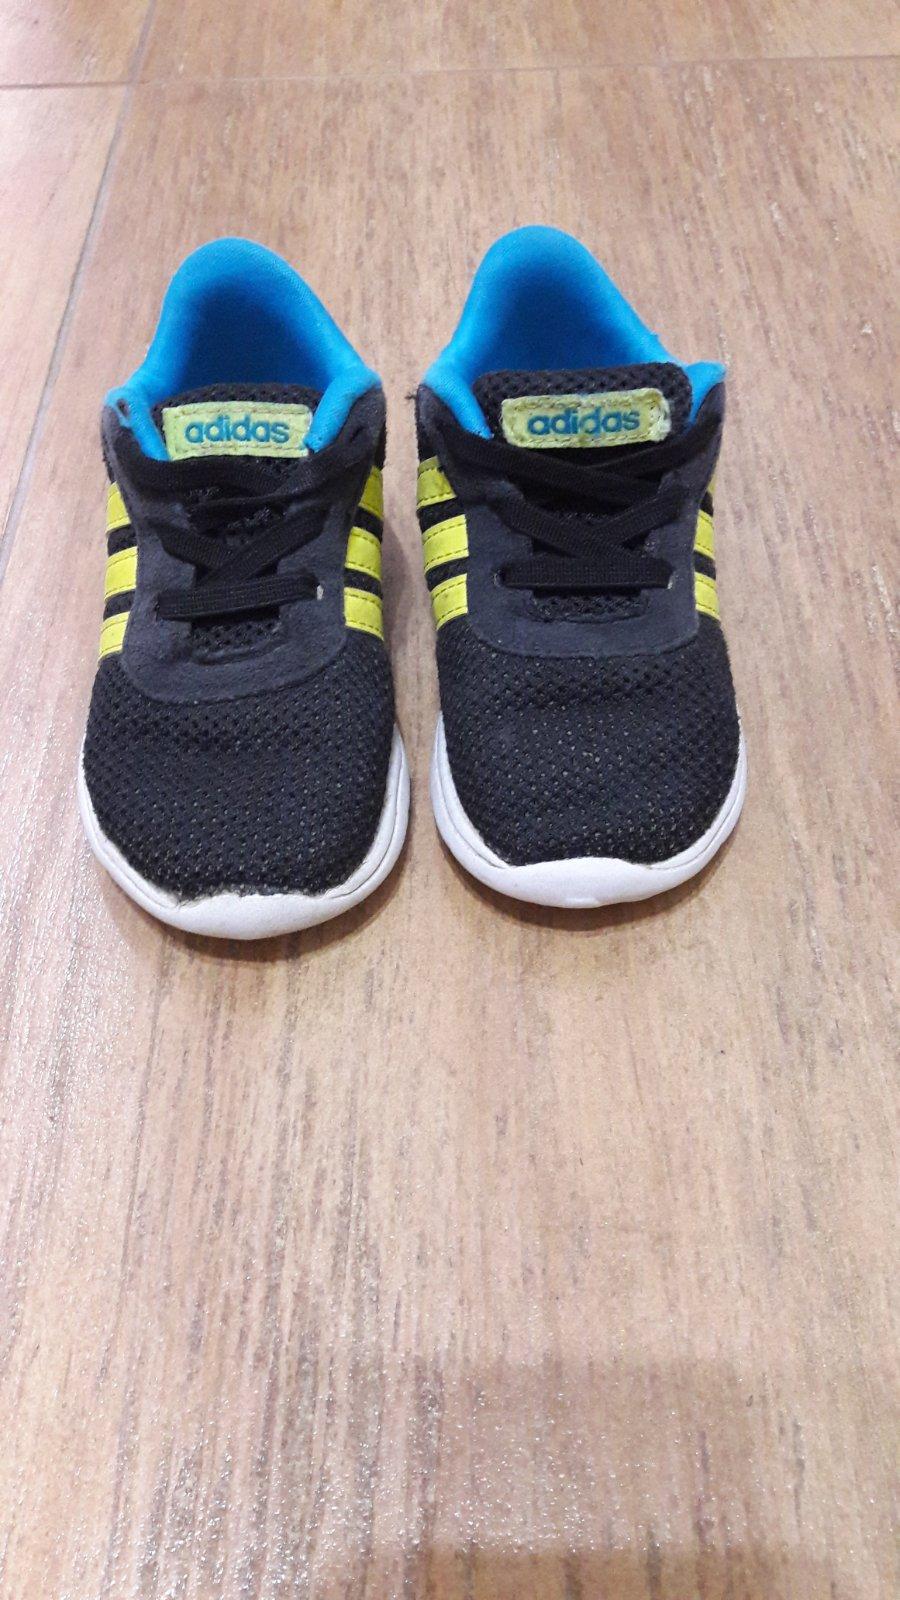 Tenisky adidas cb108600494